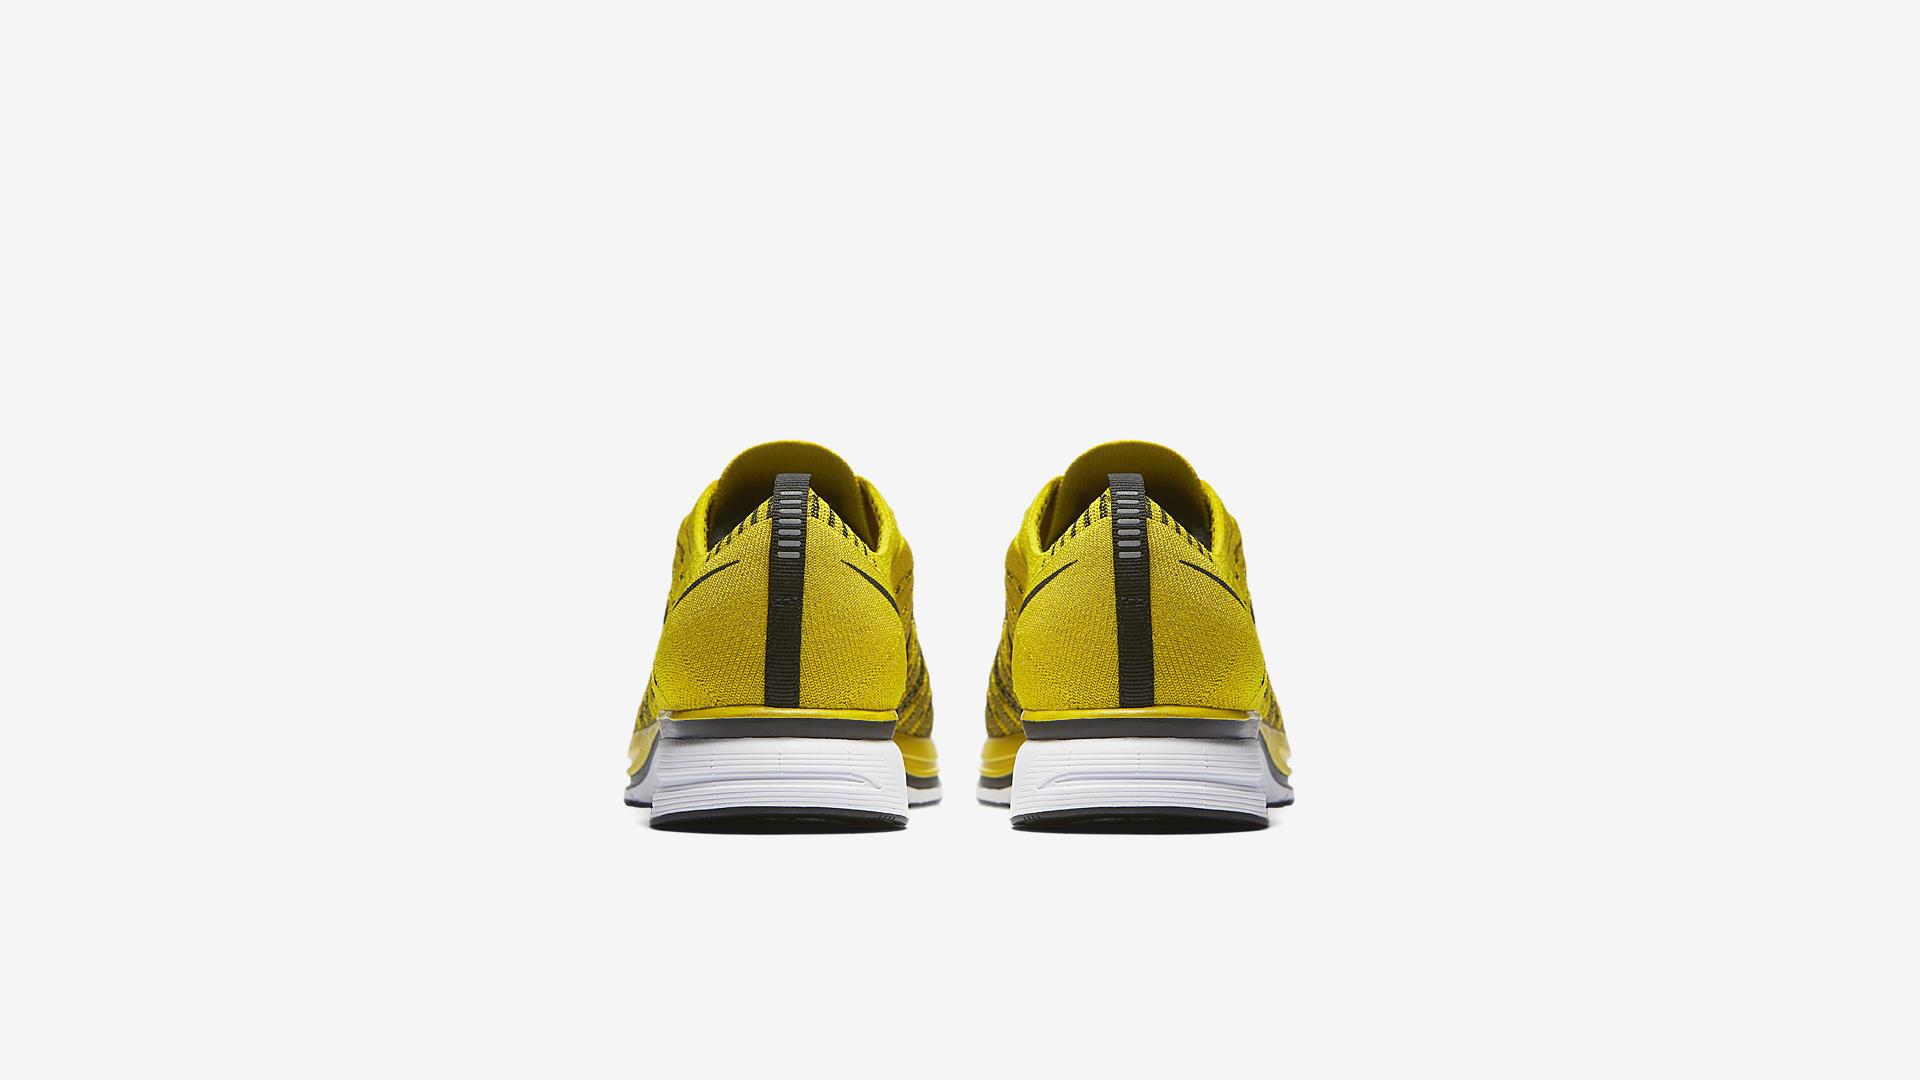 AH8396 700 Nike Flyknit Trainer Citron 2